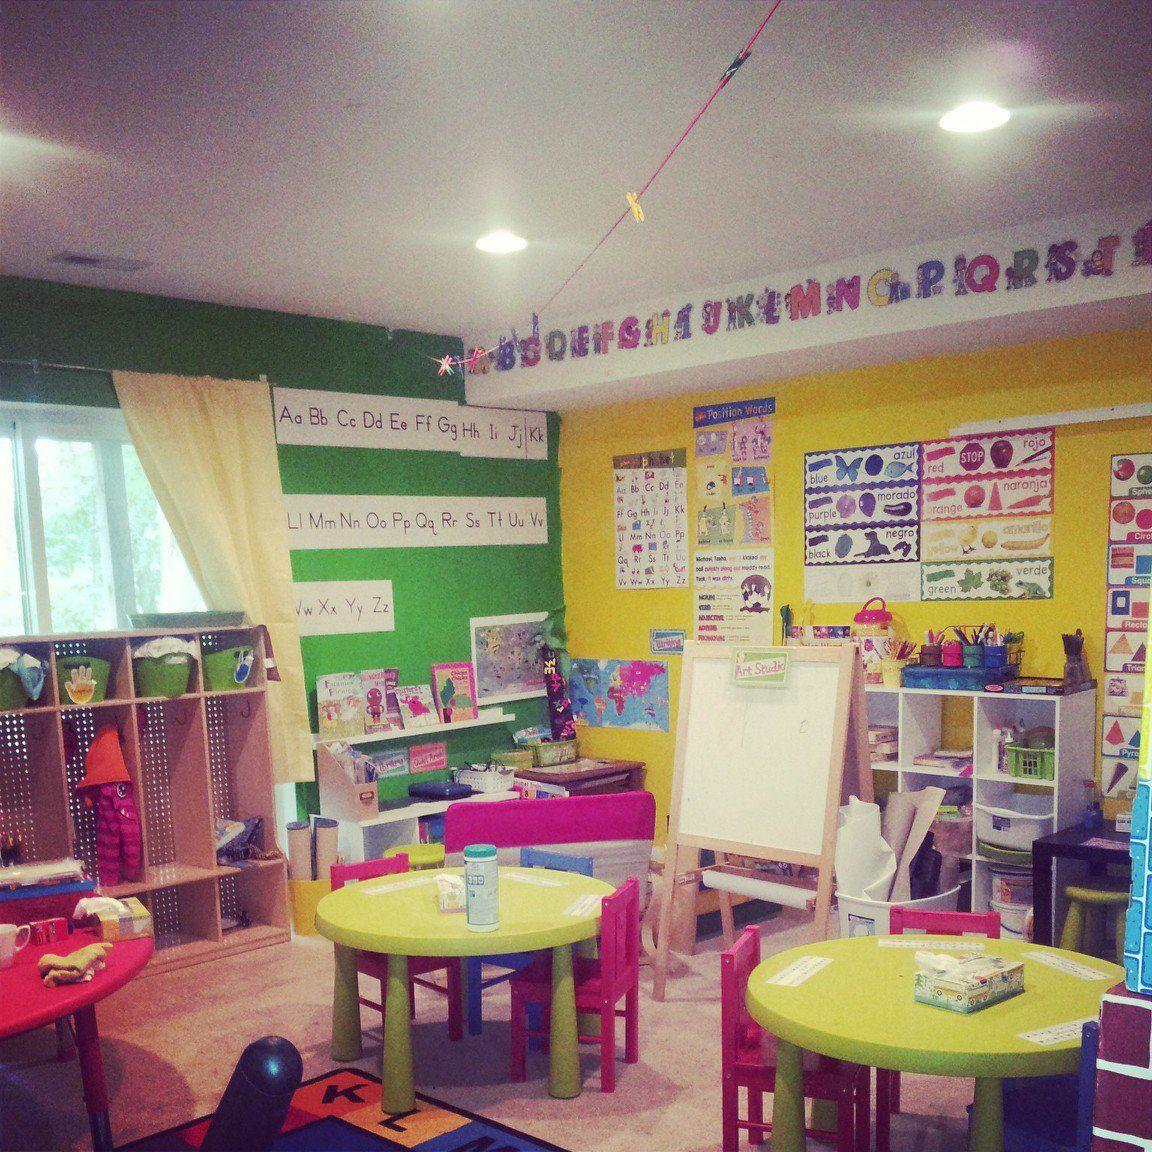 preschool rooms - Designing A Home Preschool Room